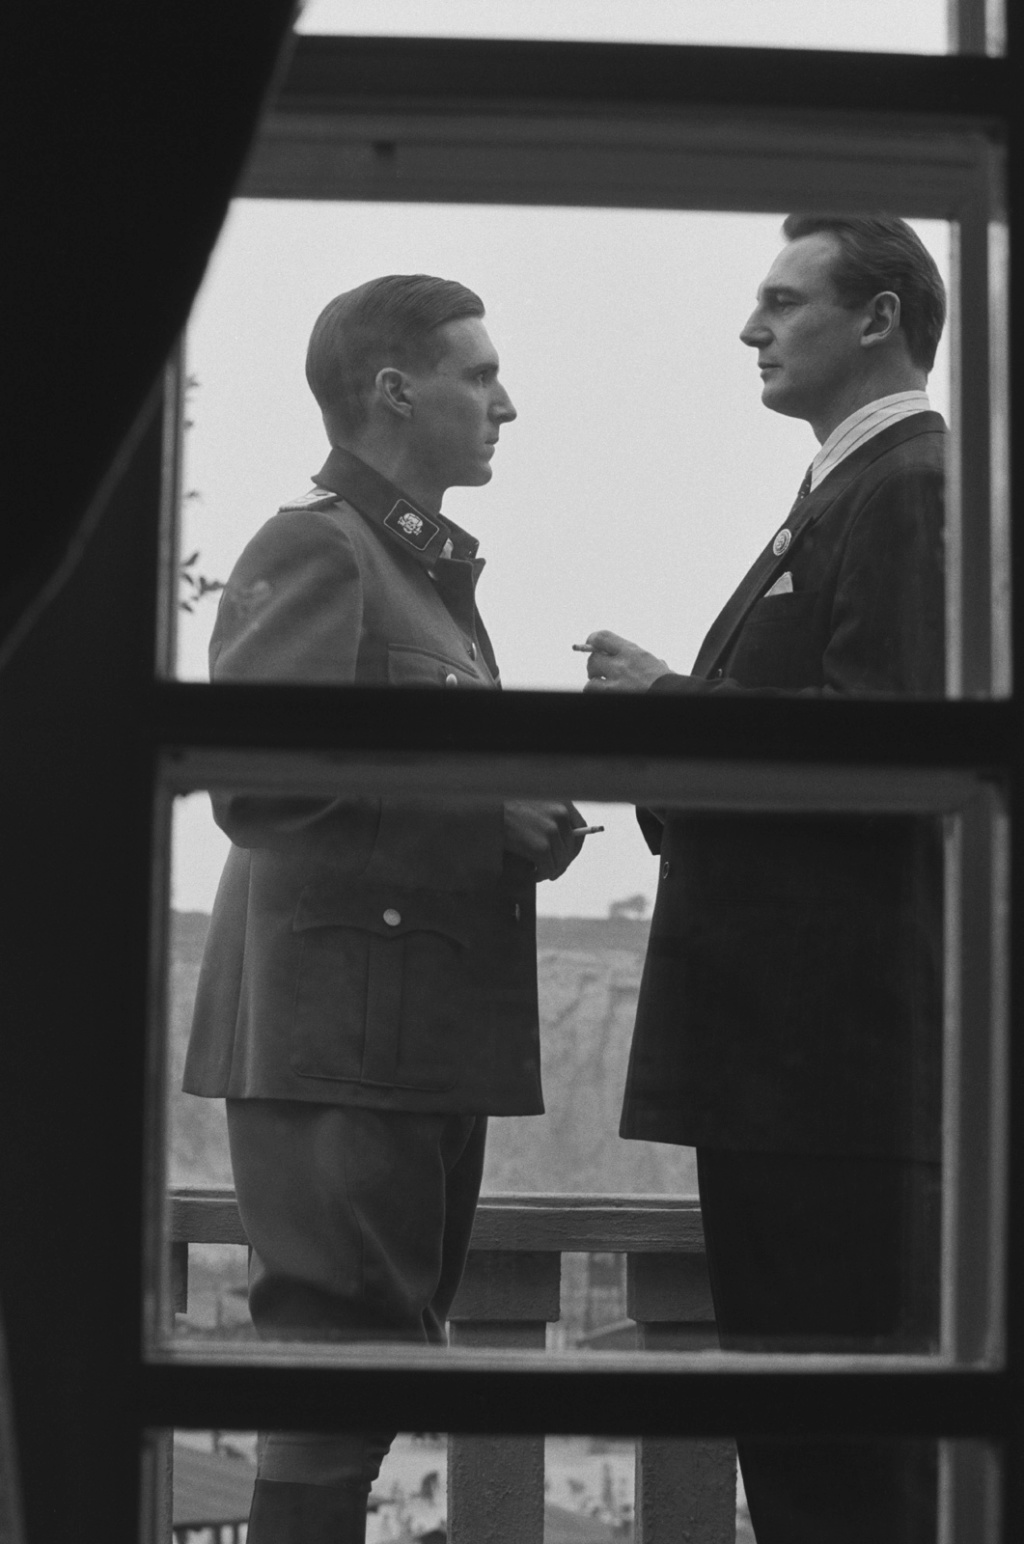 ¿Cuánto mide Liam Neeson? - Real height - Página 2 52675810